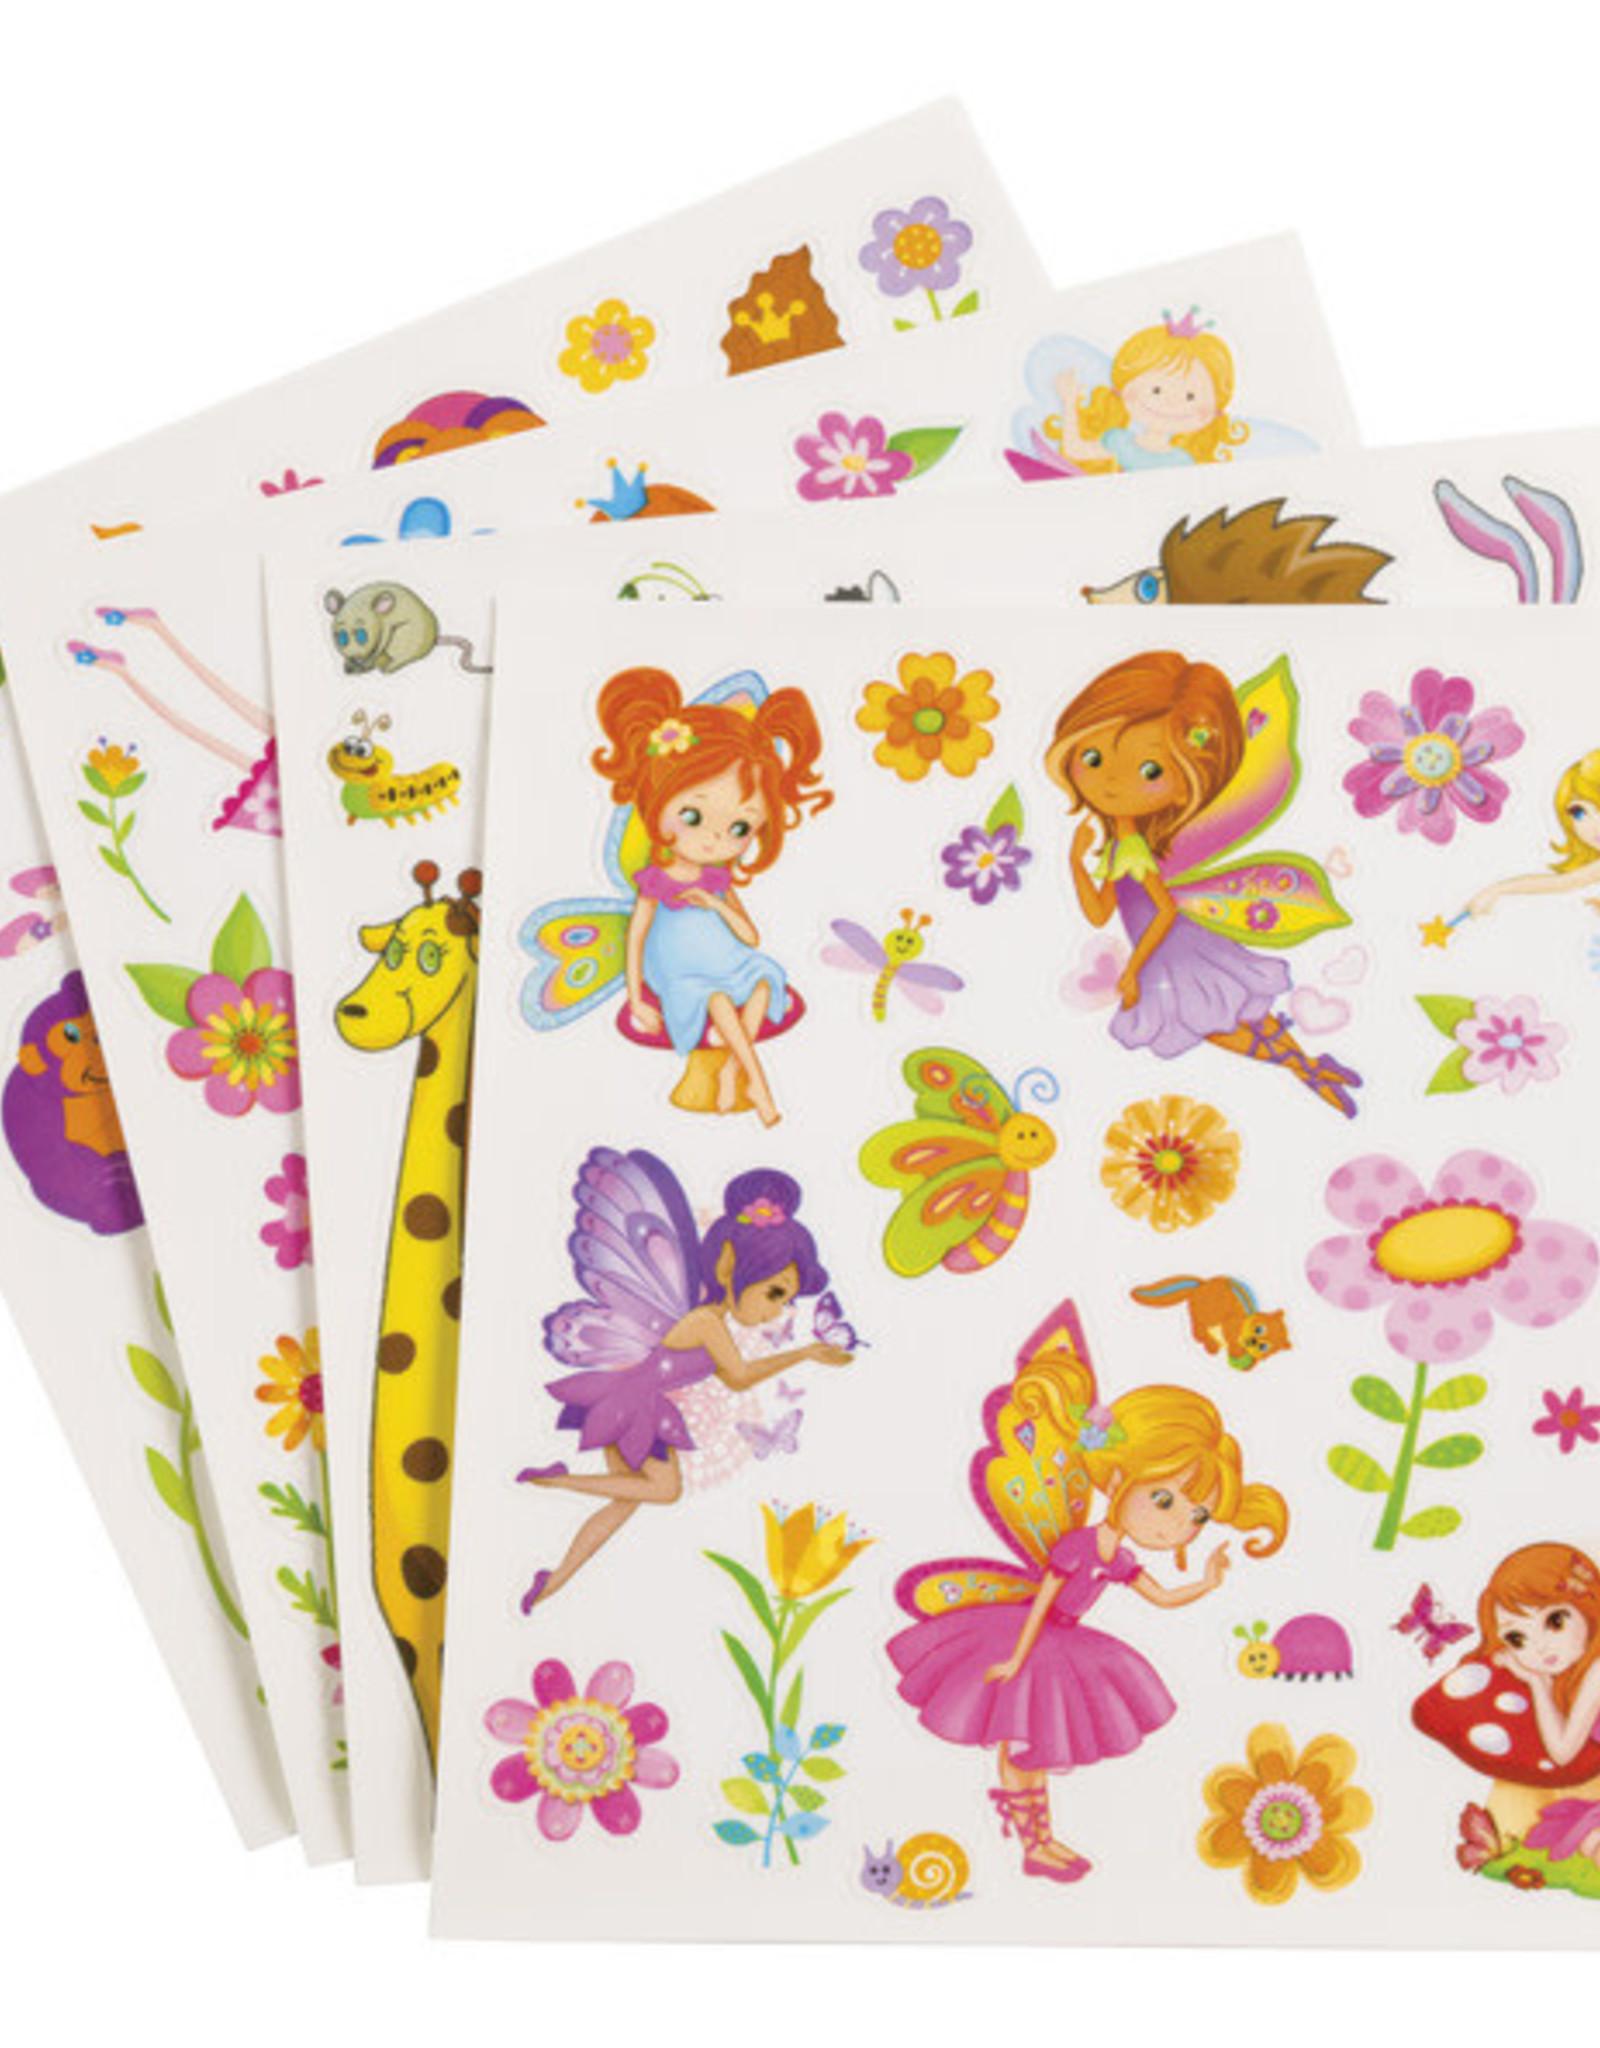 Toysmith Fairy_Princess Activity Sticker Kit